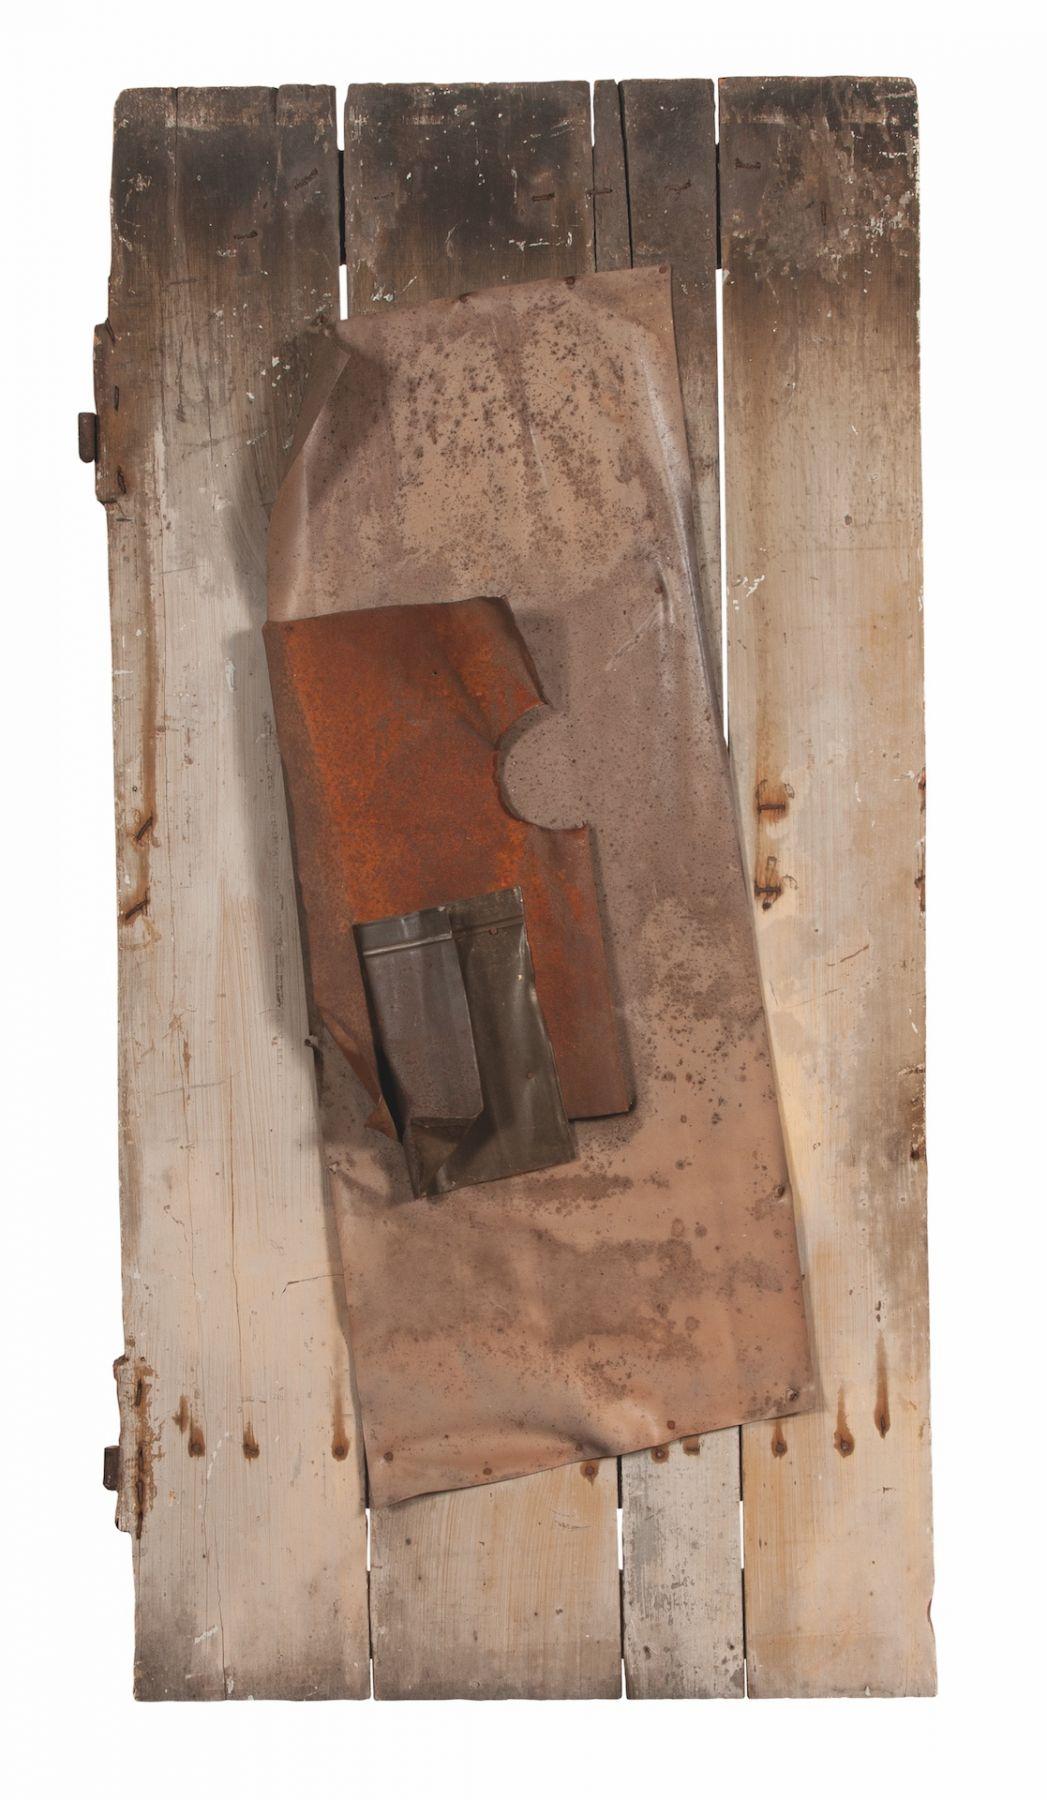 Alejandro Otero, Viva la demolición [Long Live the Demolition], 1962. Metal, Cardboard, plastic, and metal grate on wood, 55 7/8 x 28 5/16 in. (142 x 72 cm.)